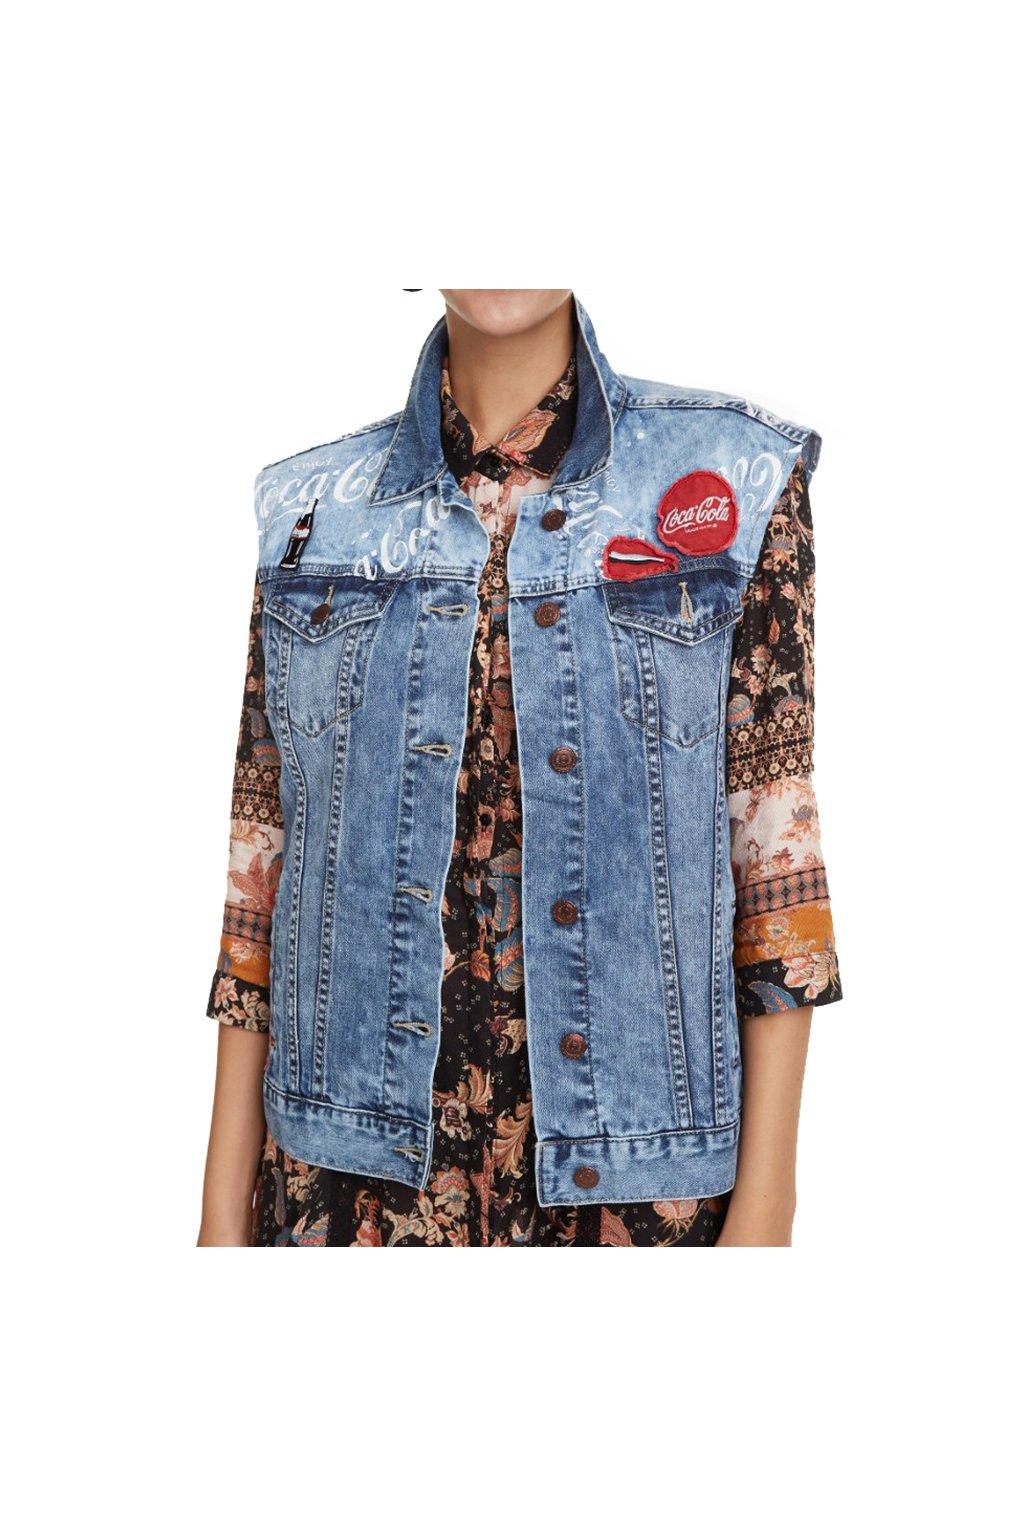 Riflová vesta Desigual 18WWEDX7/5183